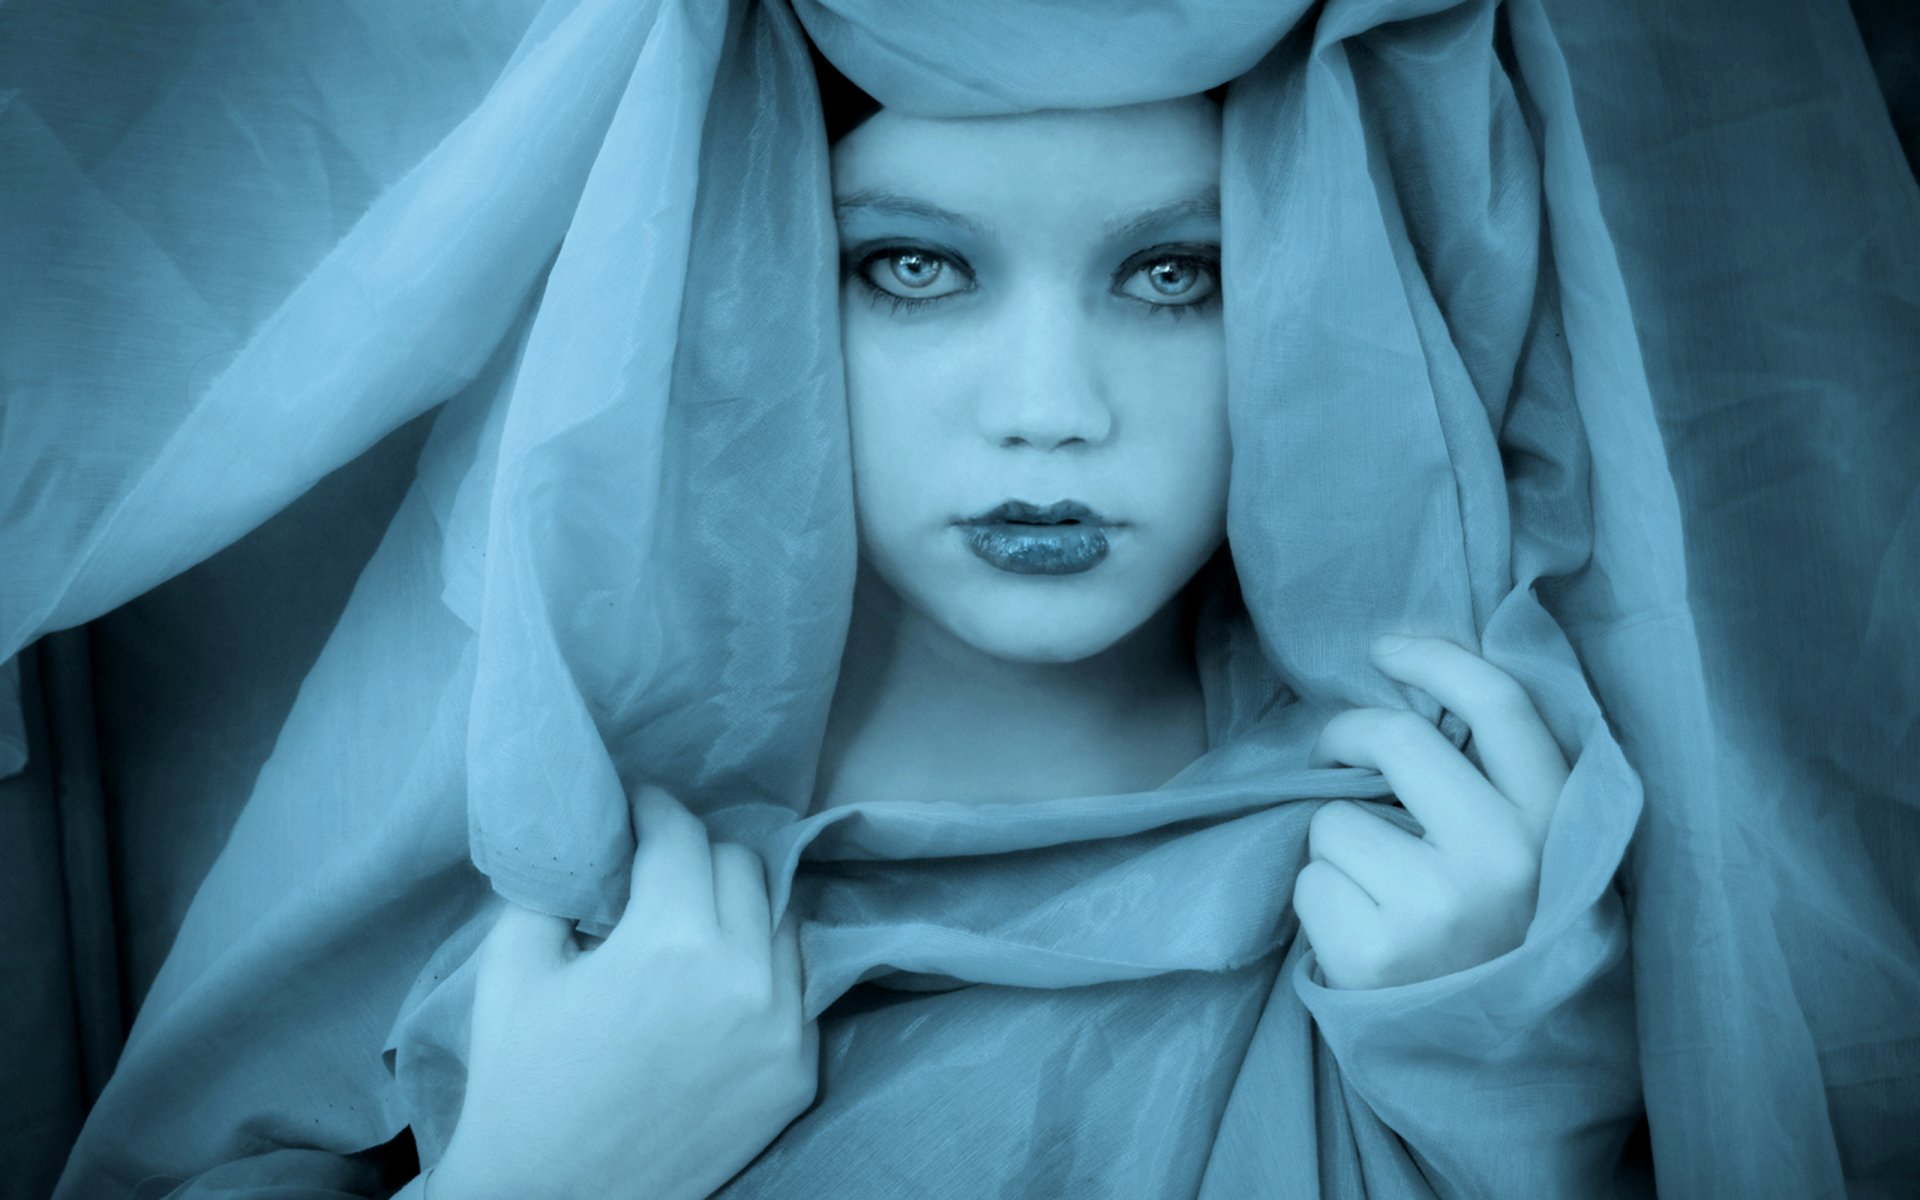 Fantaisie - Femmes  Fond d'écran